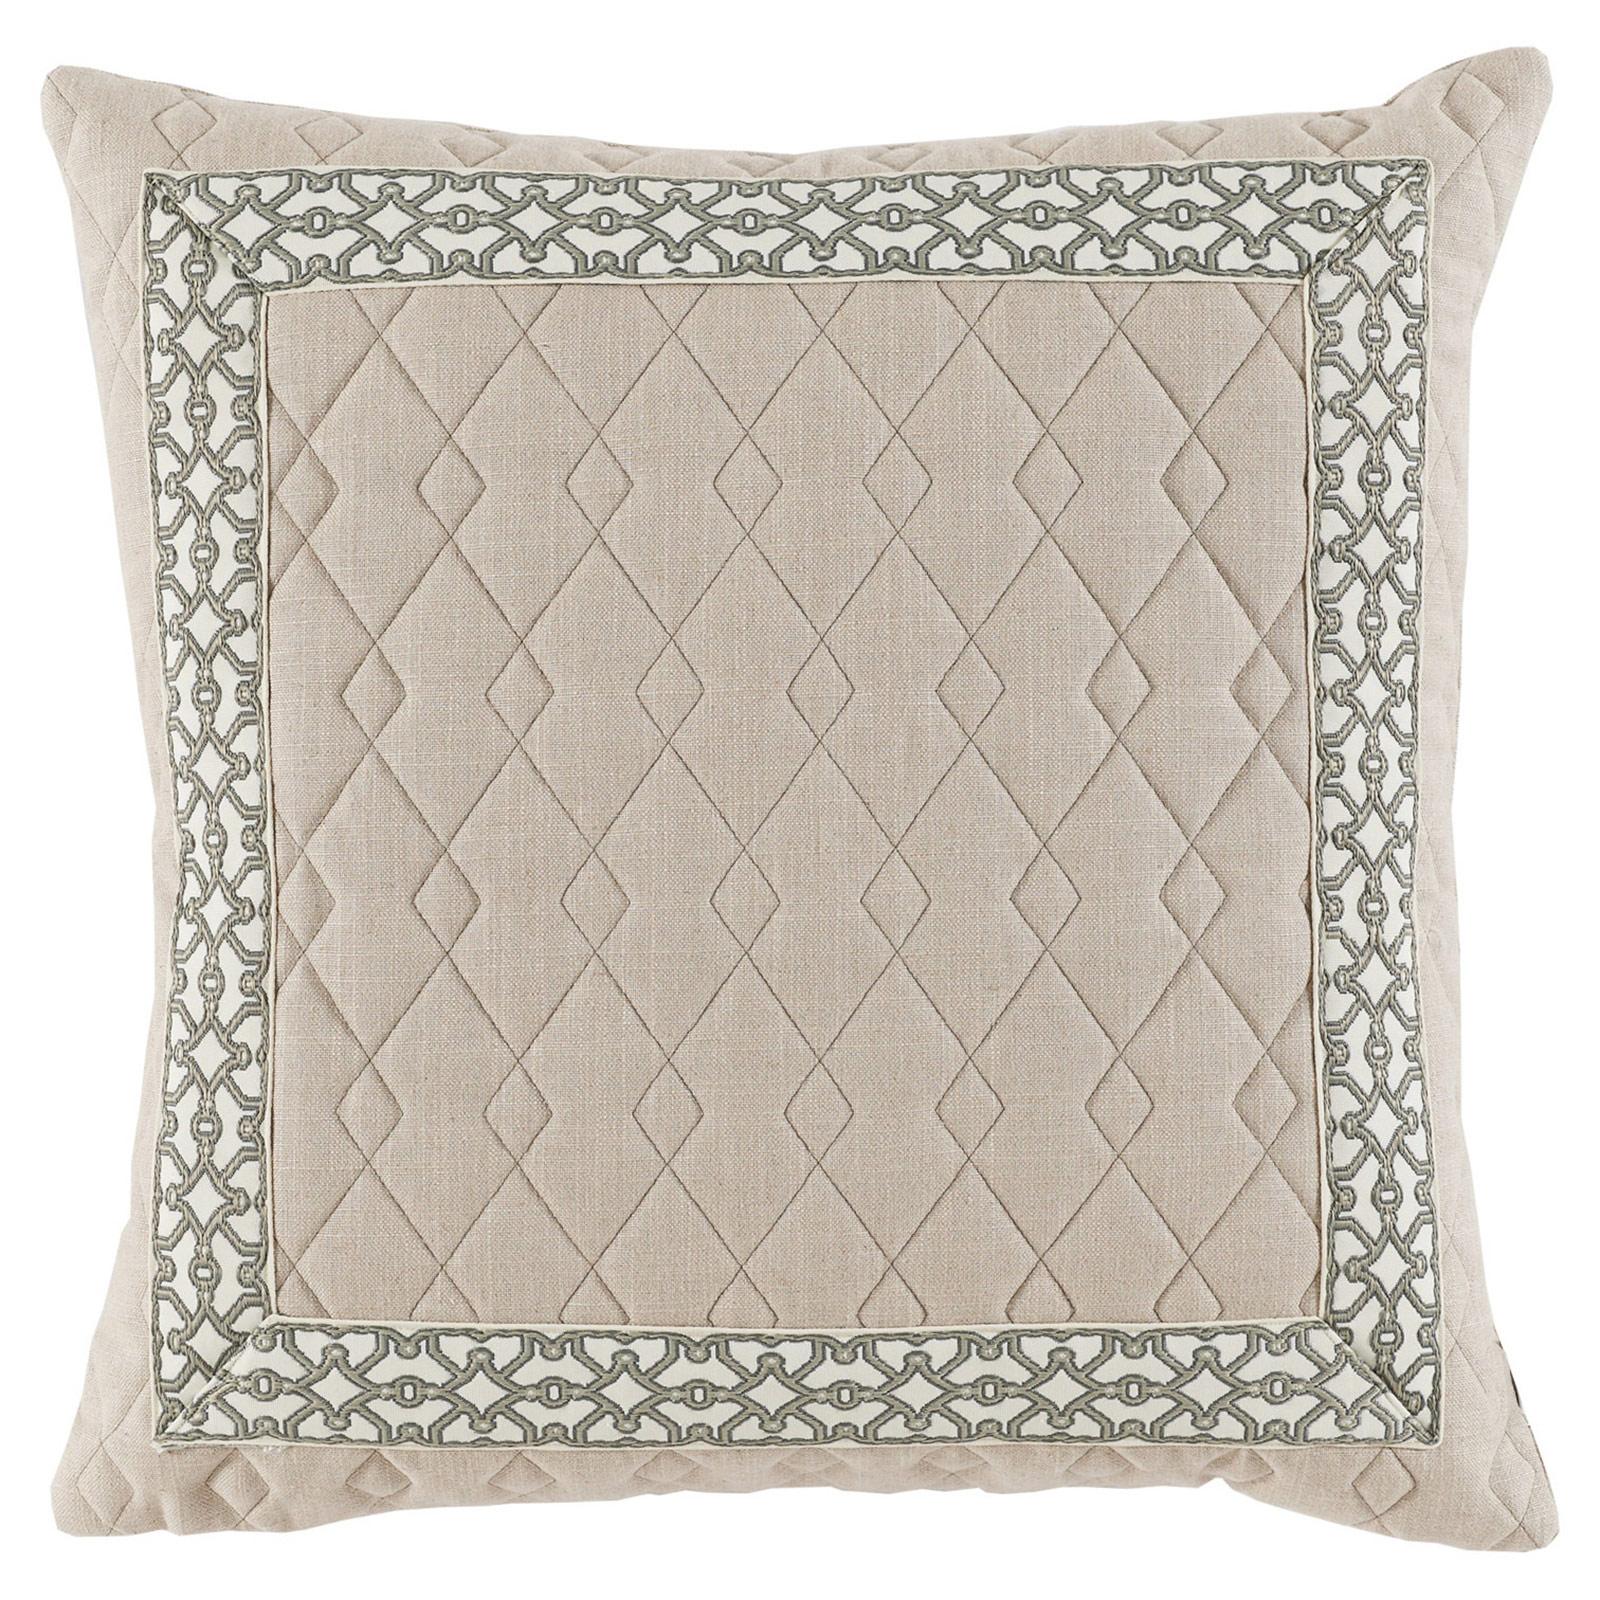 Dori Modern Classic Diamond Quilt Beige Trim Pillow - 22x22